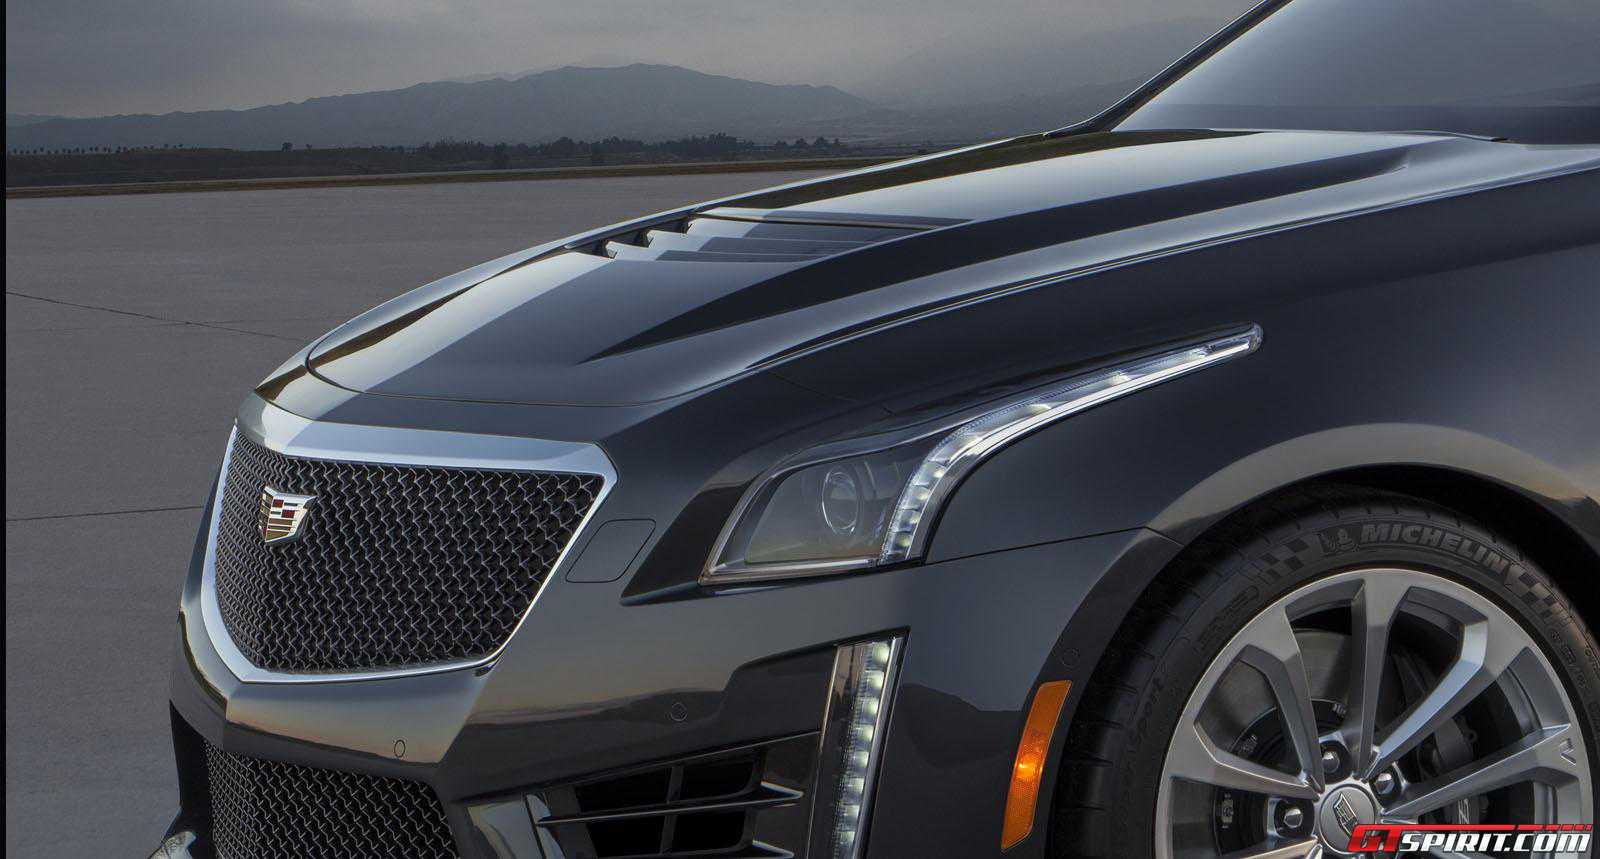 Gallery 2016 Cadillac CTS-V - 15 photos - GTspirit